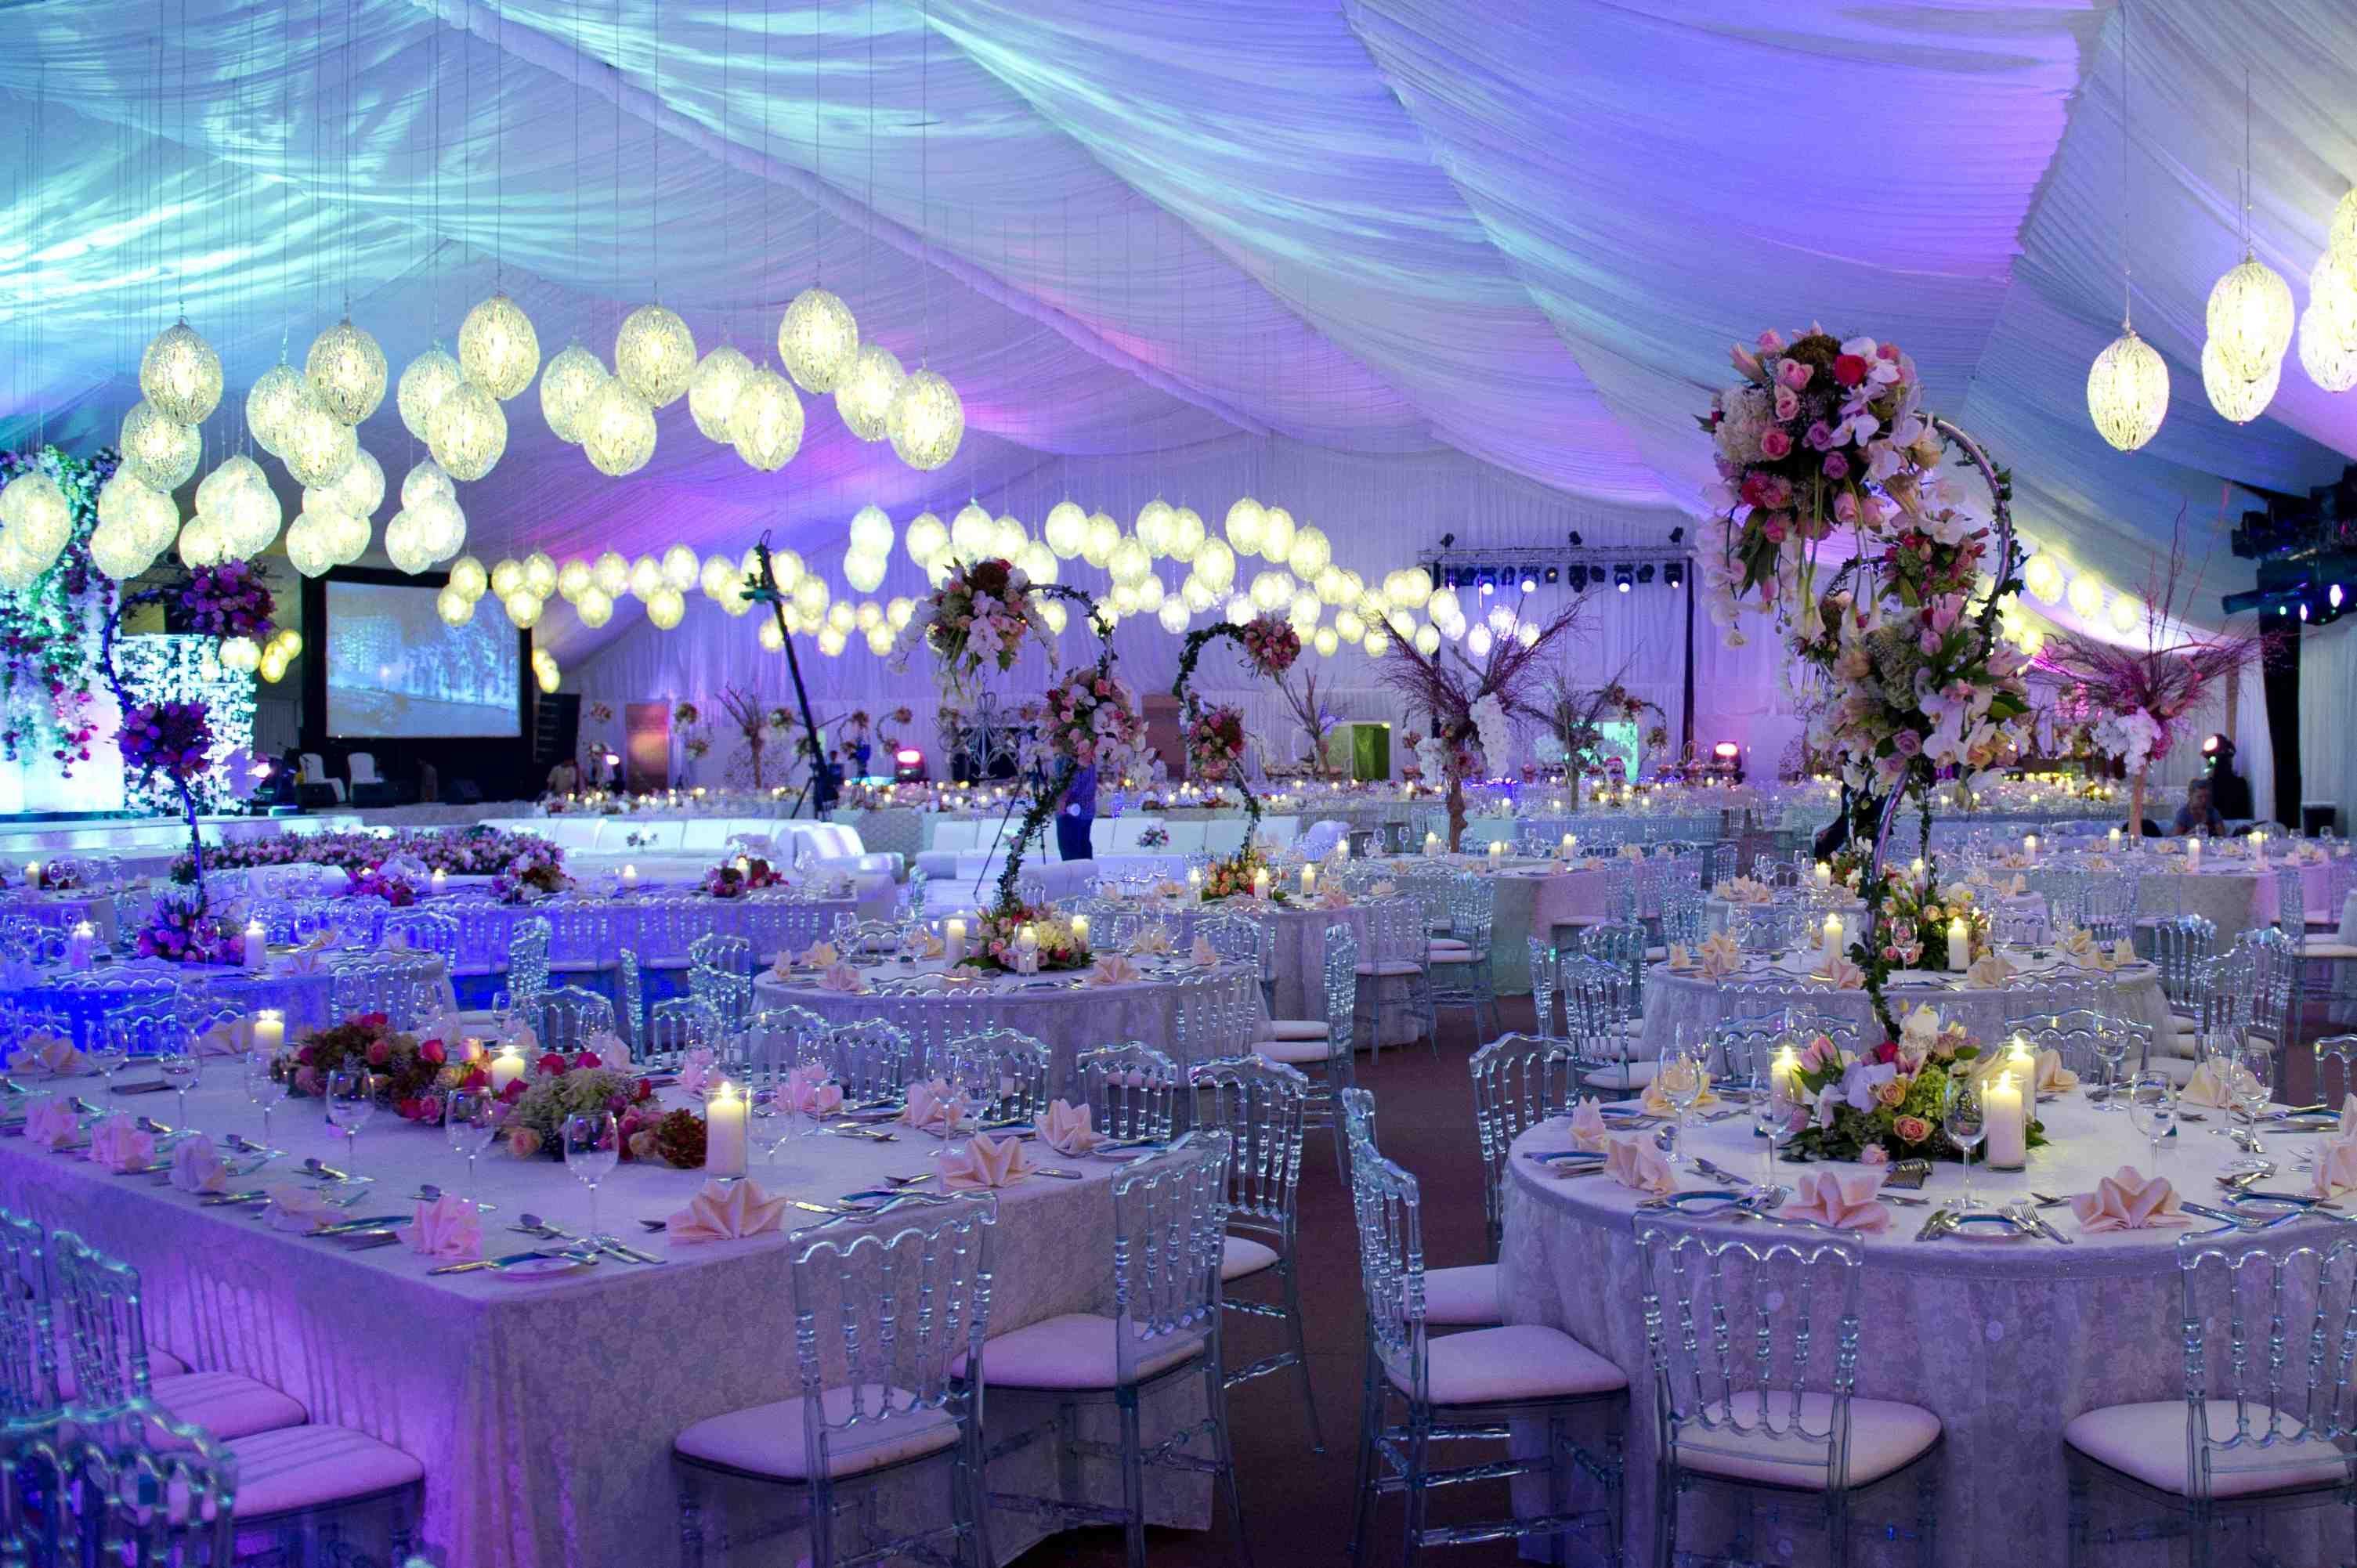 Wedding stage decoration dubai  dubai weddings  Bing Images  Wedding  In Dubai  Pinterest